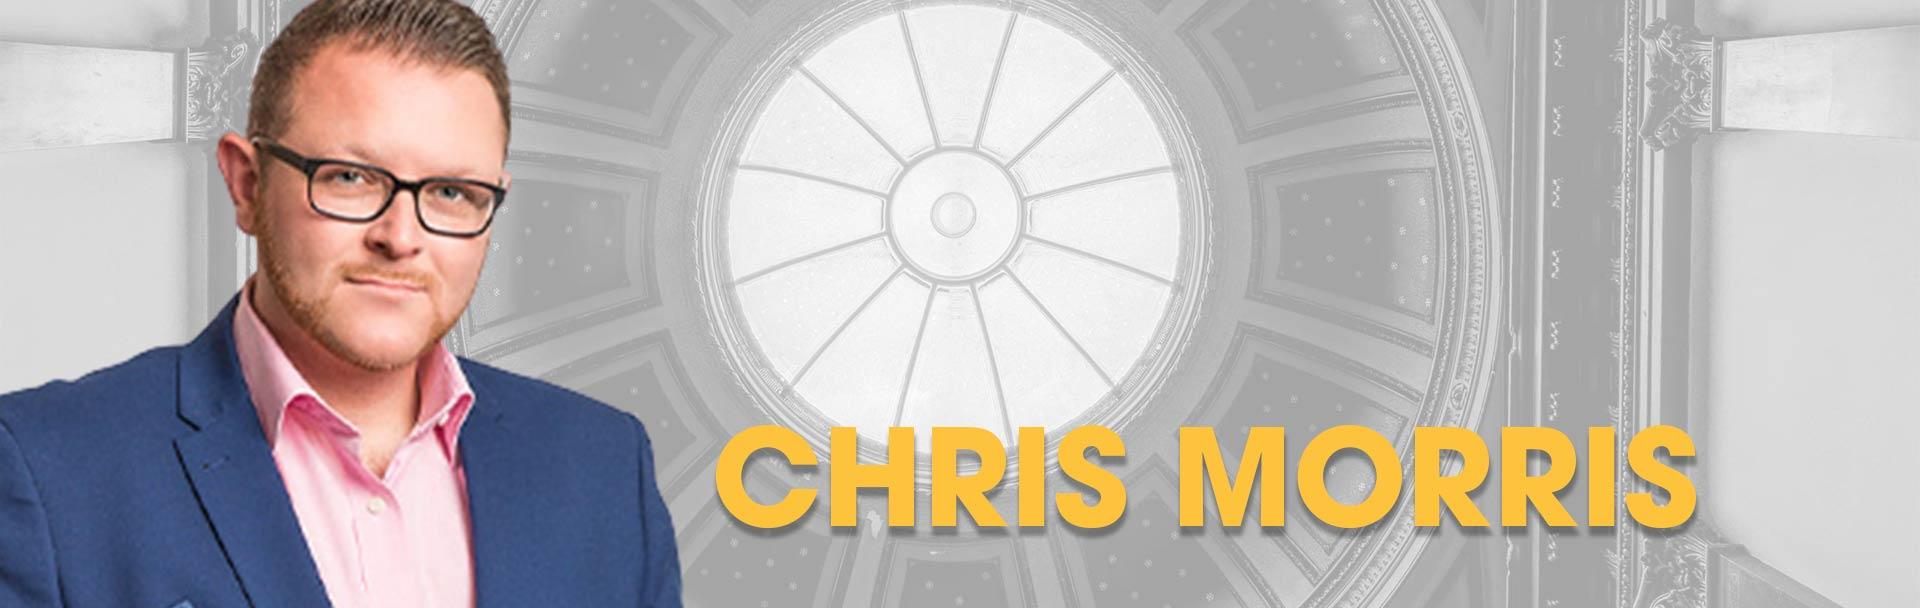 Chris Morris is part of Saturday Night Demonstrations of Mediumship at the Sir Arthur Conan Doyle Centre